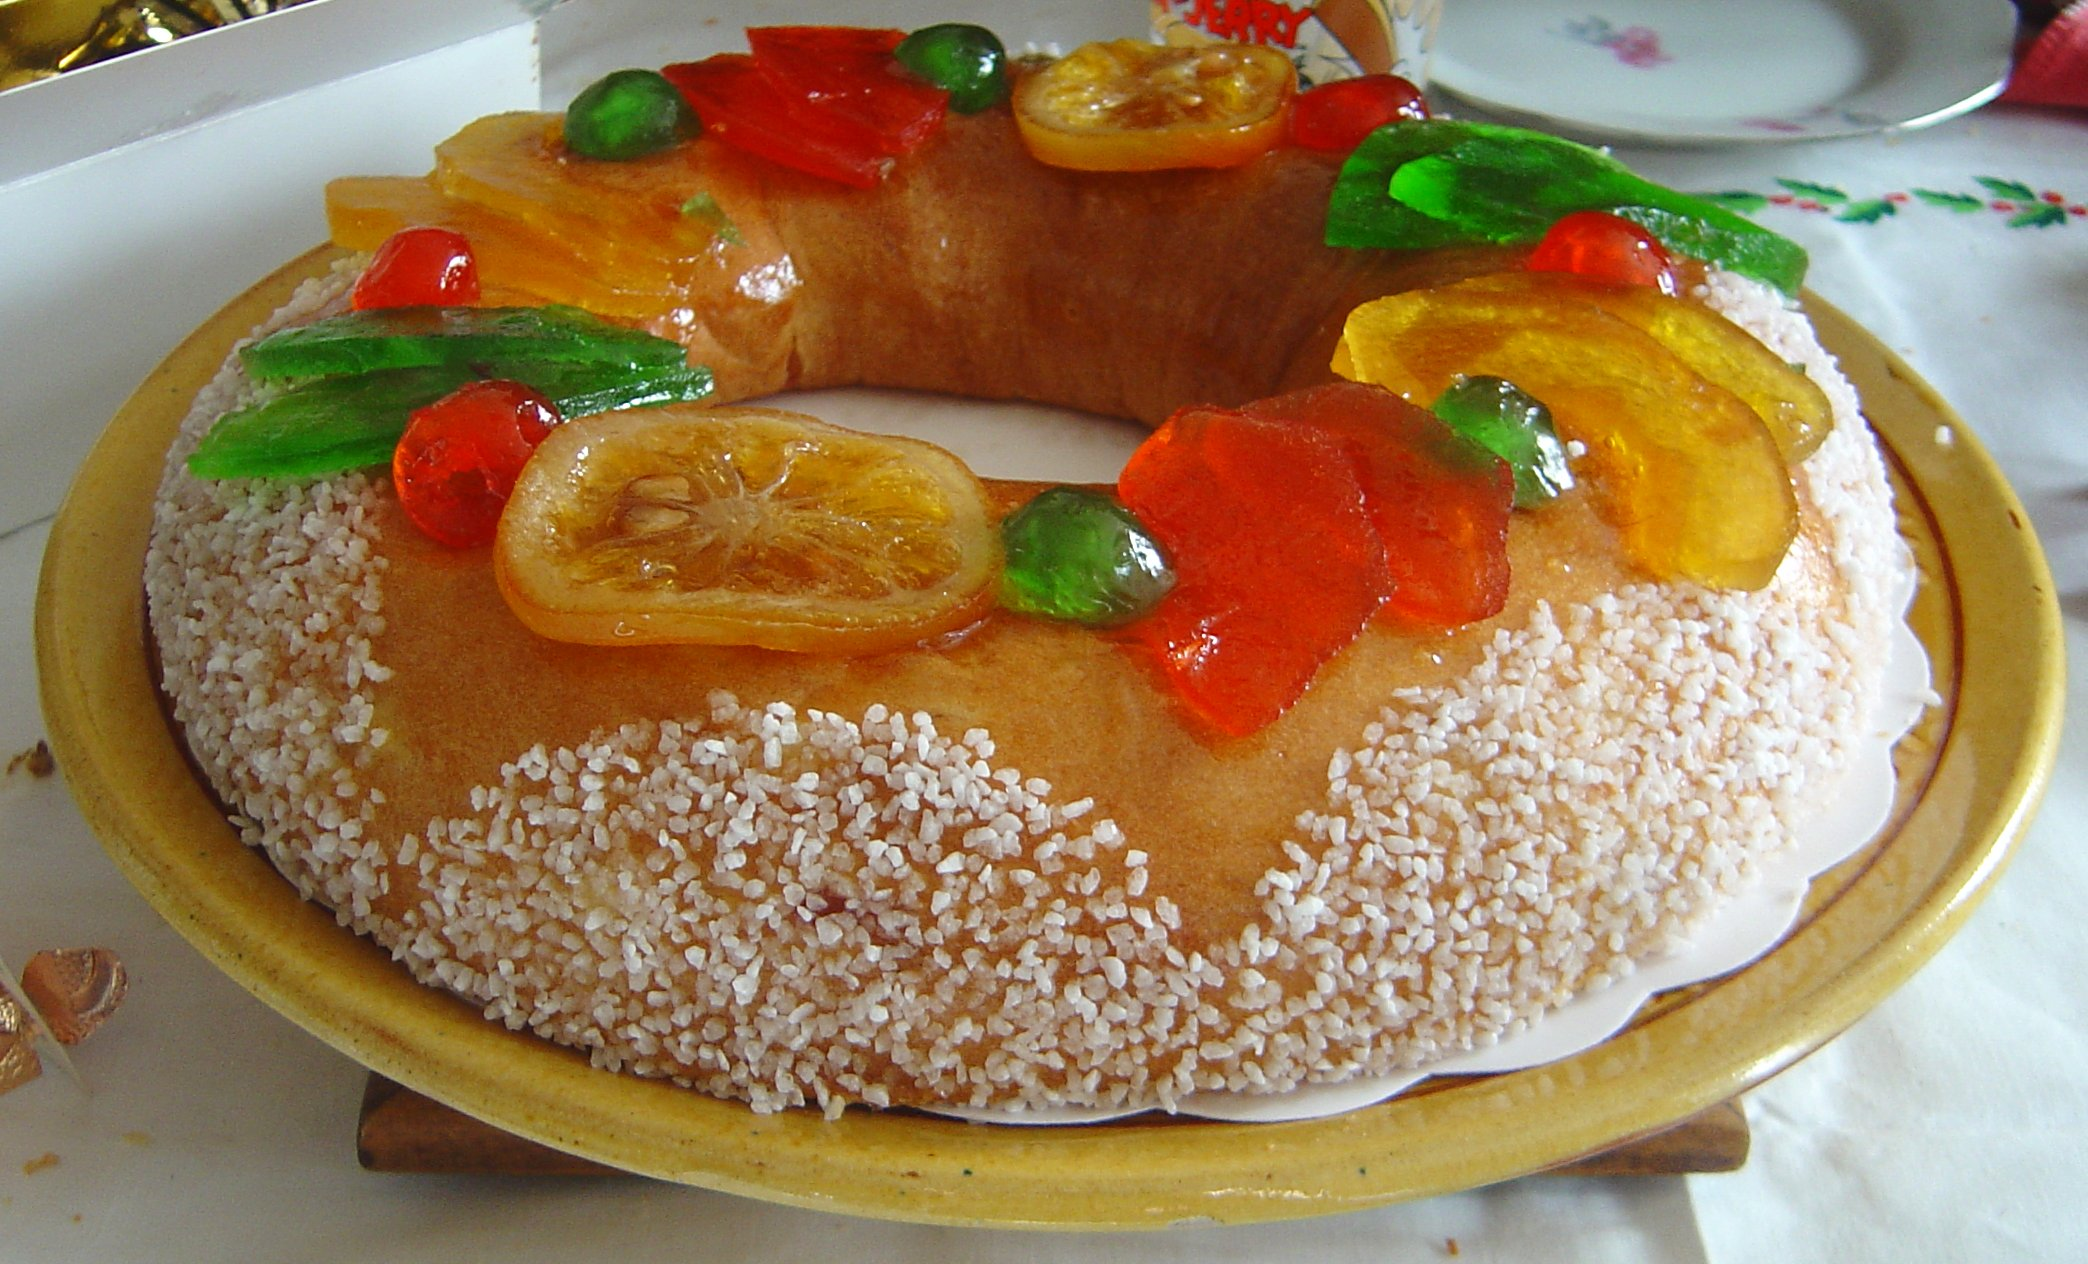 King cake - Wikipedia, the free encyclopedia